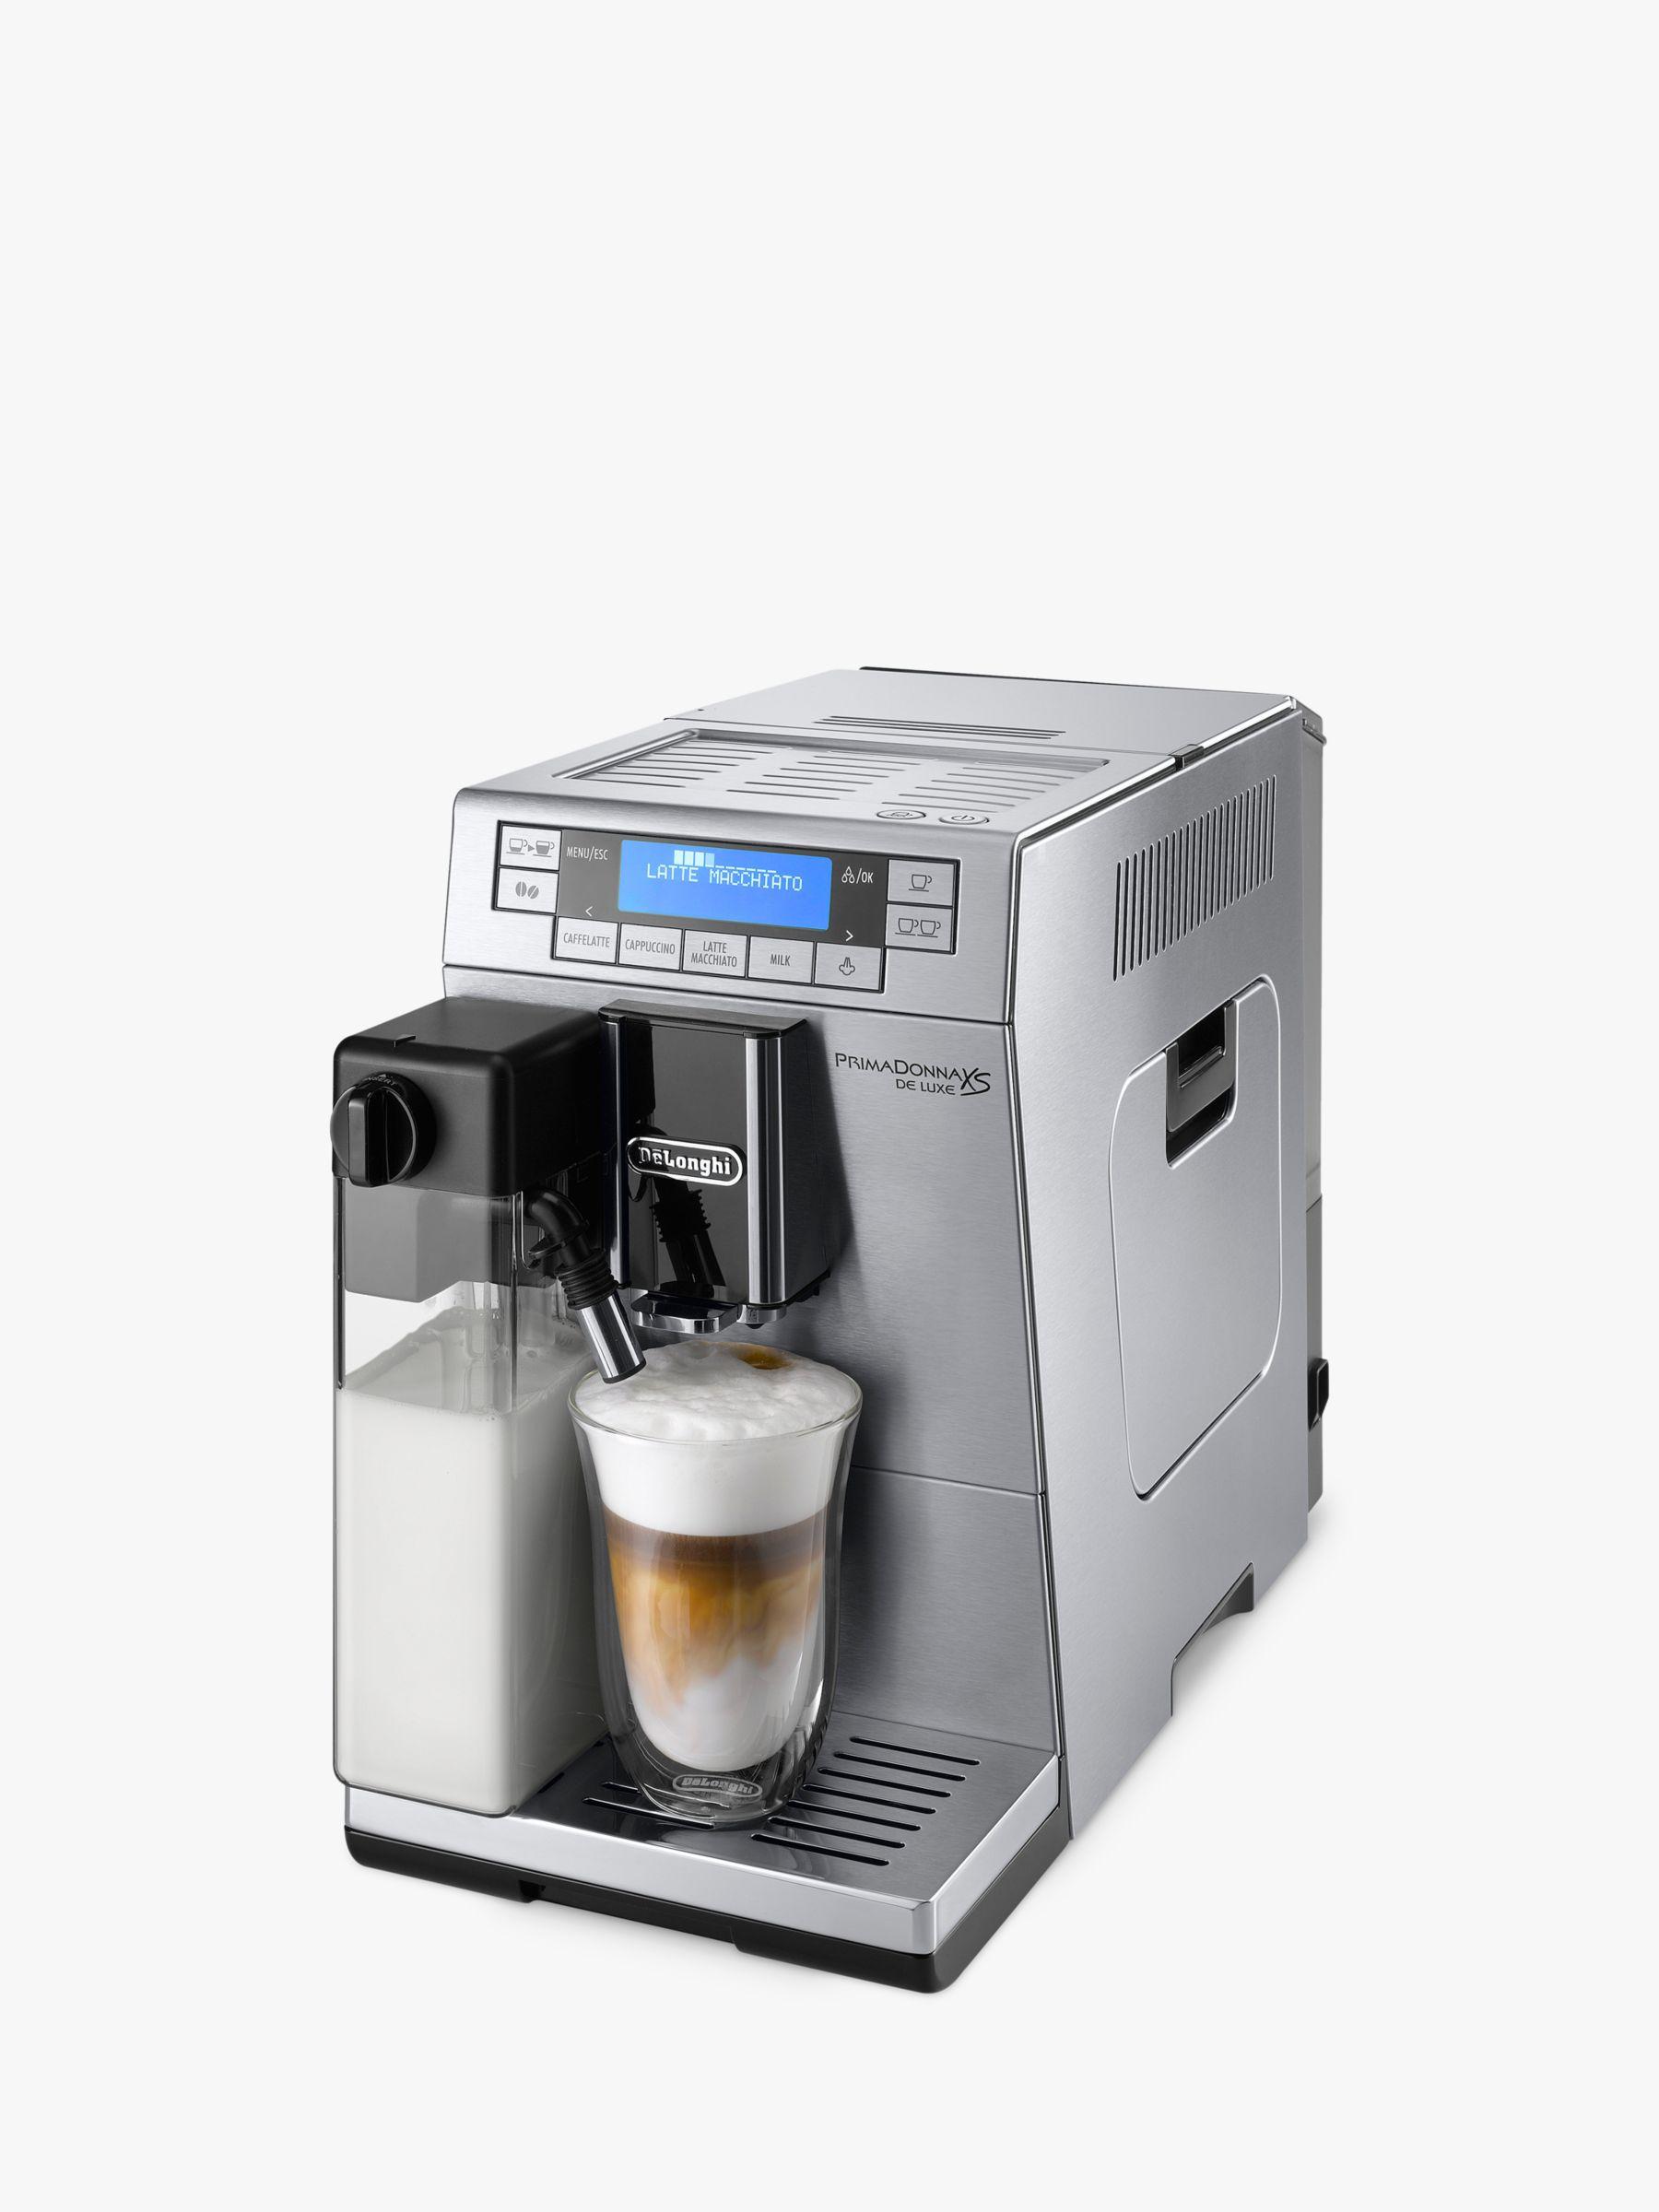 Electronic Cheapest Delonghi Coffee Machine buy delonghi etam36 365 primadonna xs bean to cup coffee machine